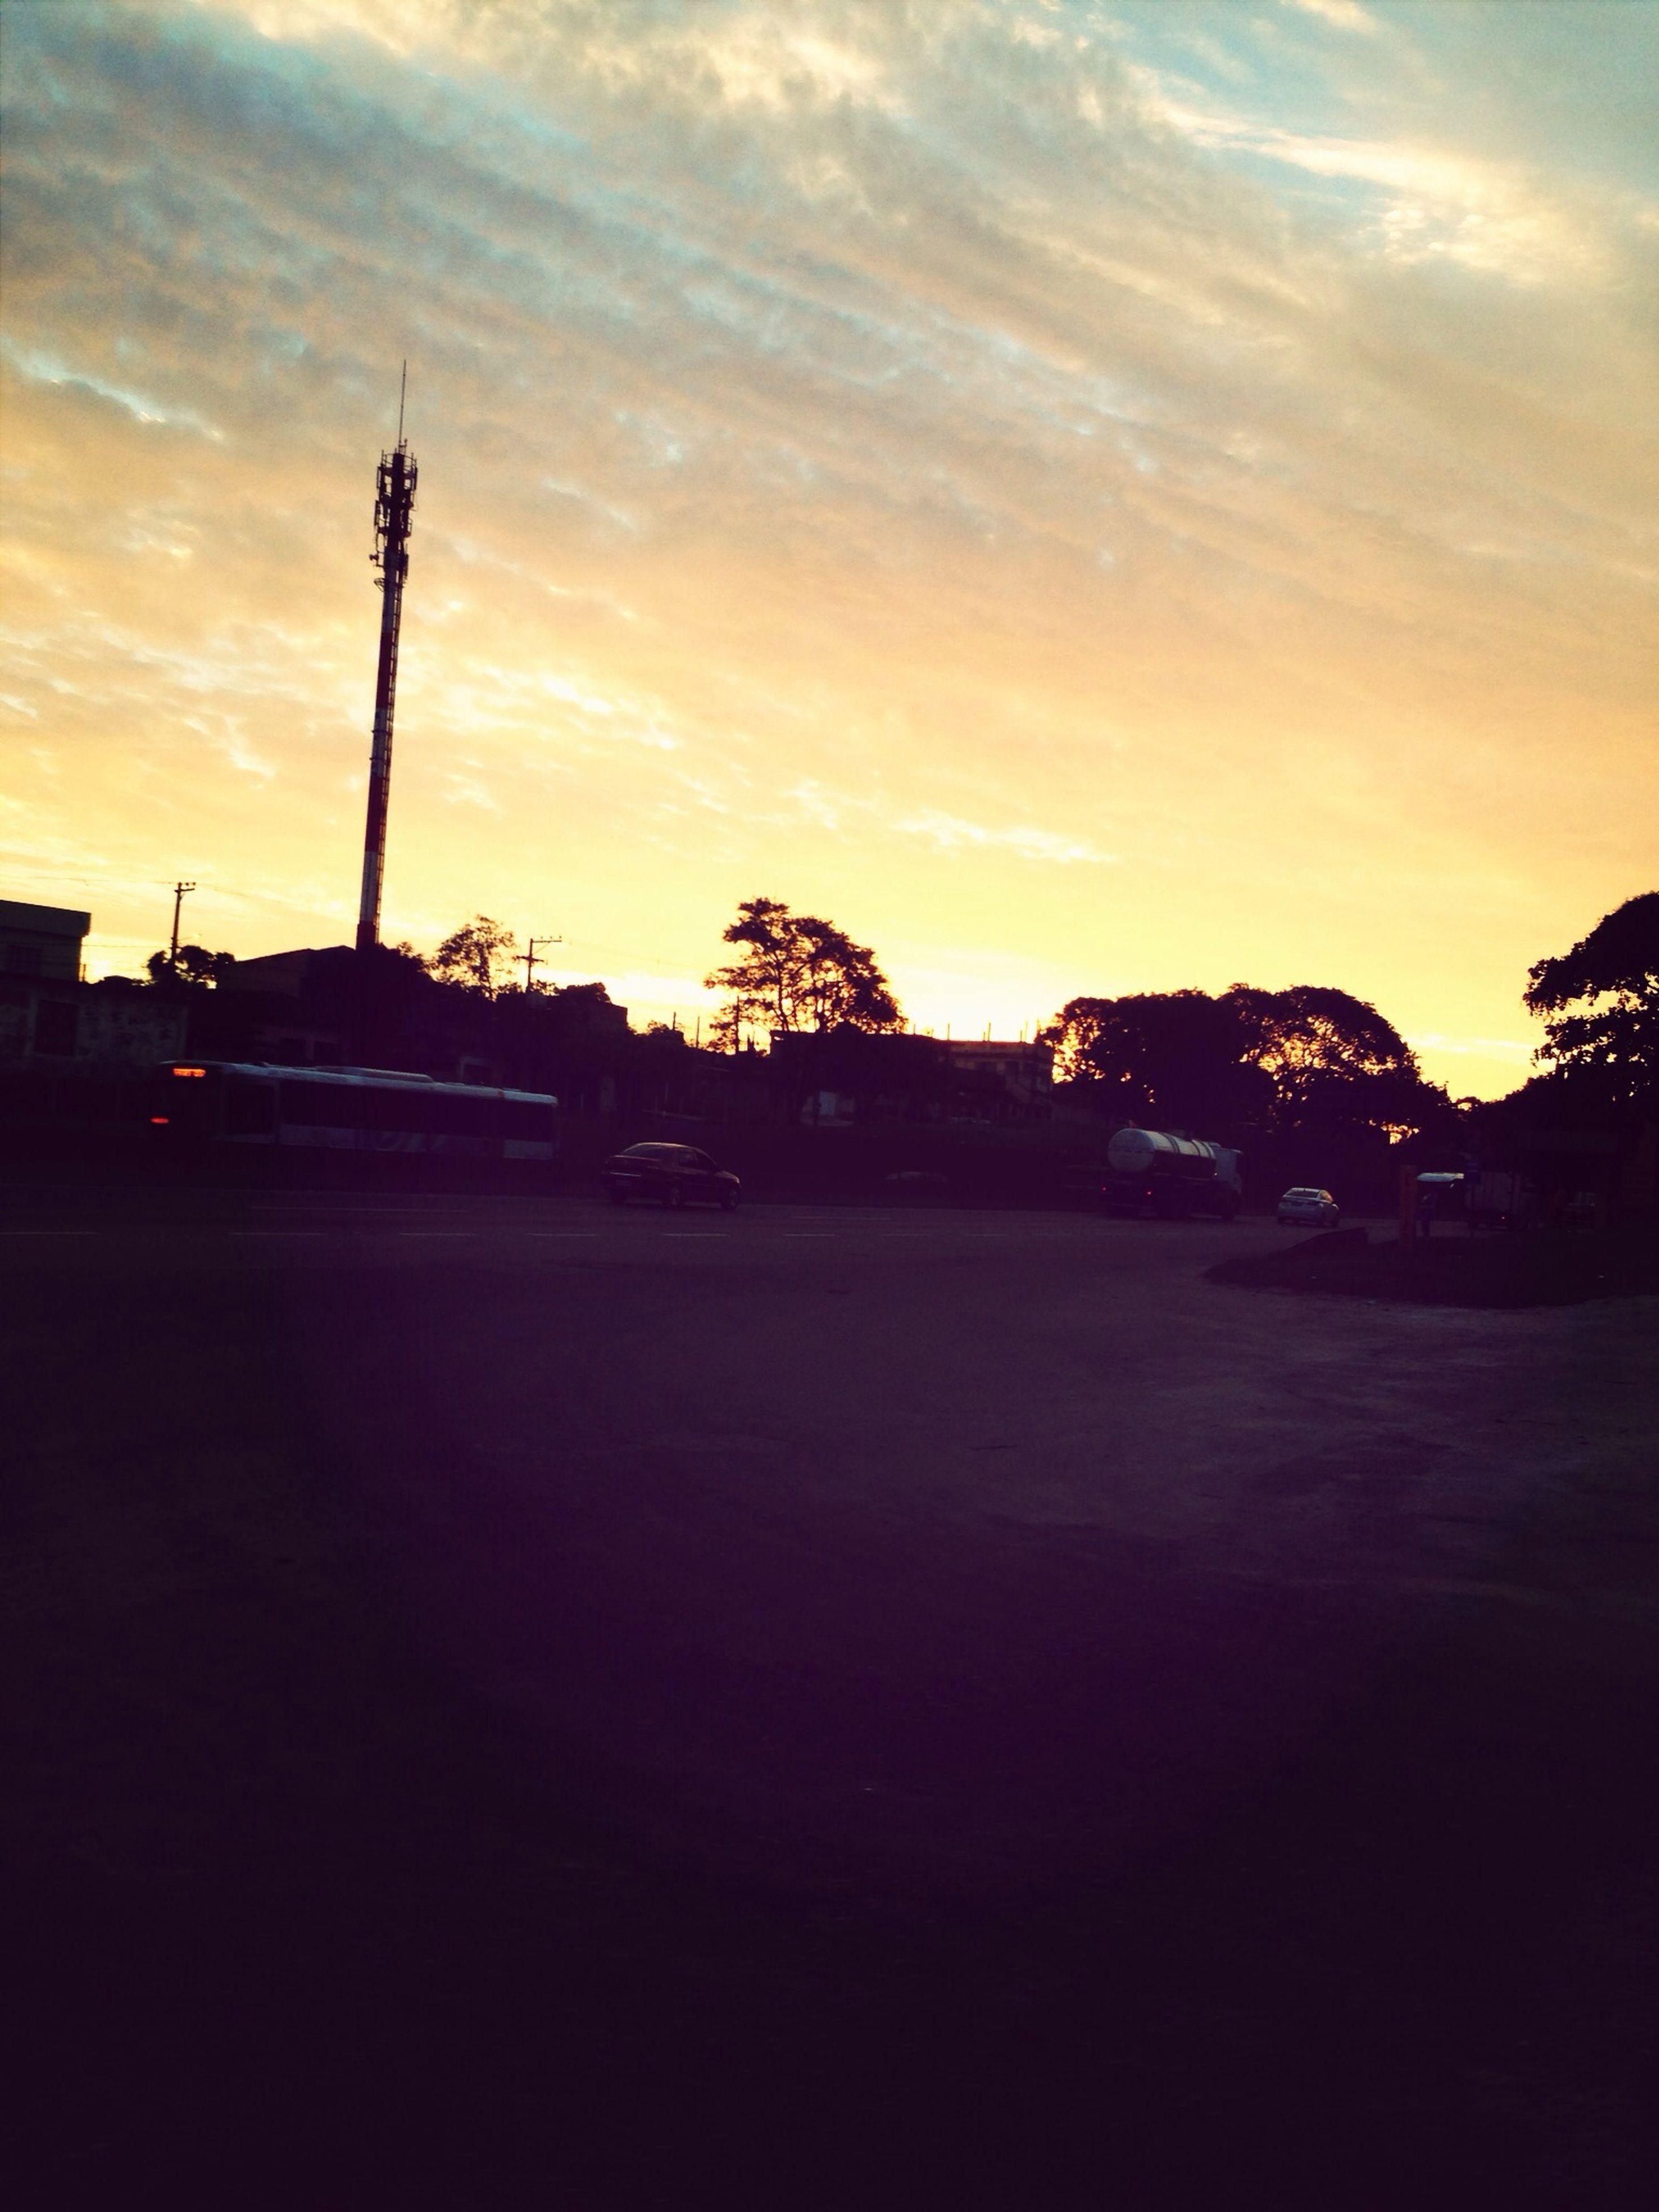 sunset, sky, silhouette, street light, cloud - sky, tree, road, street, building exterior, built structure, dusk, transportation, architecture, orange color, cloud, nature, outdoors, cloudy, car, the way forward